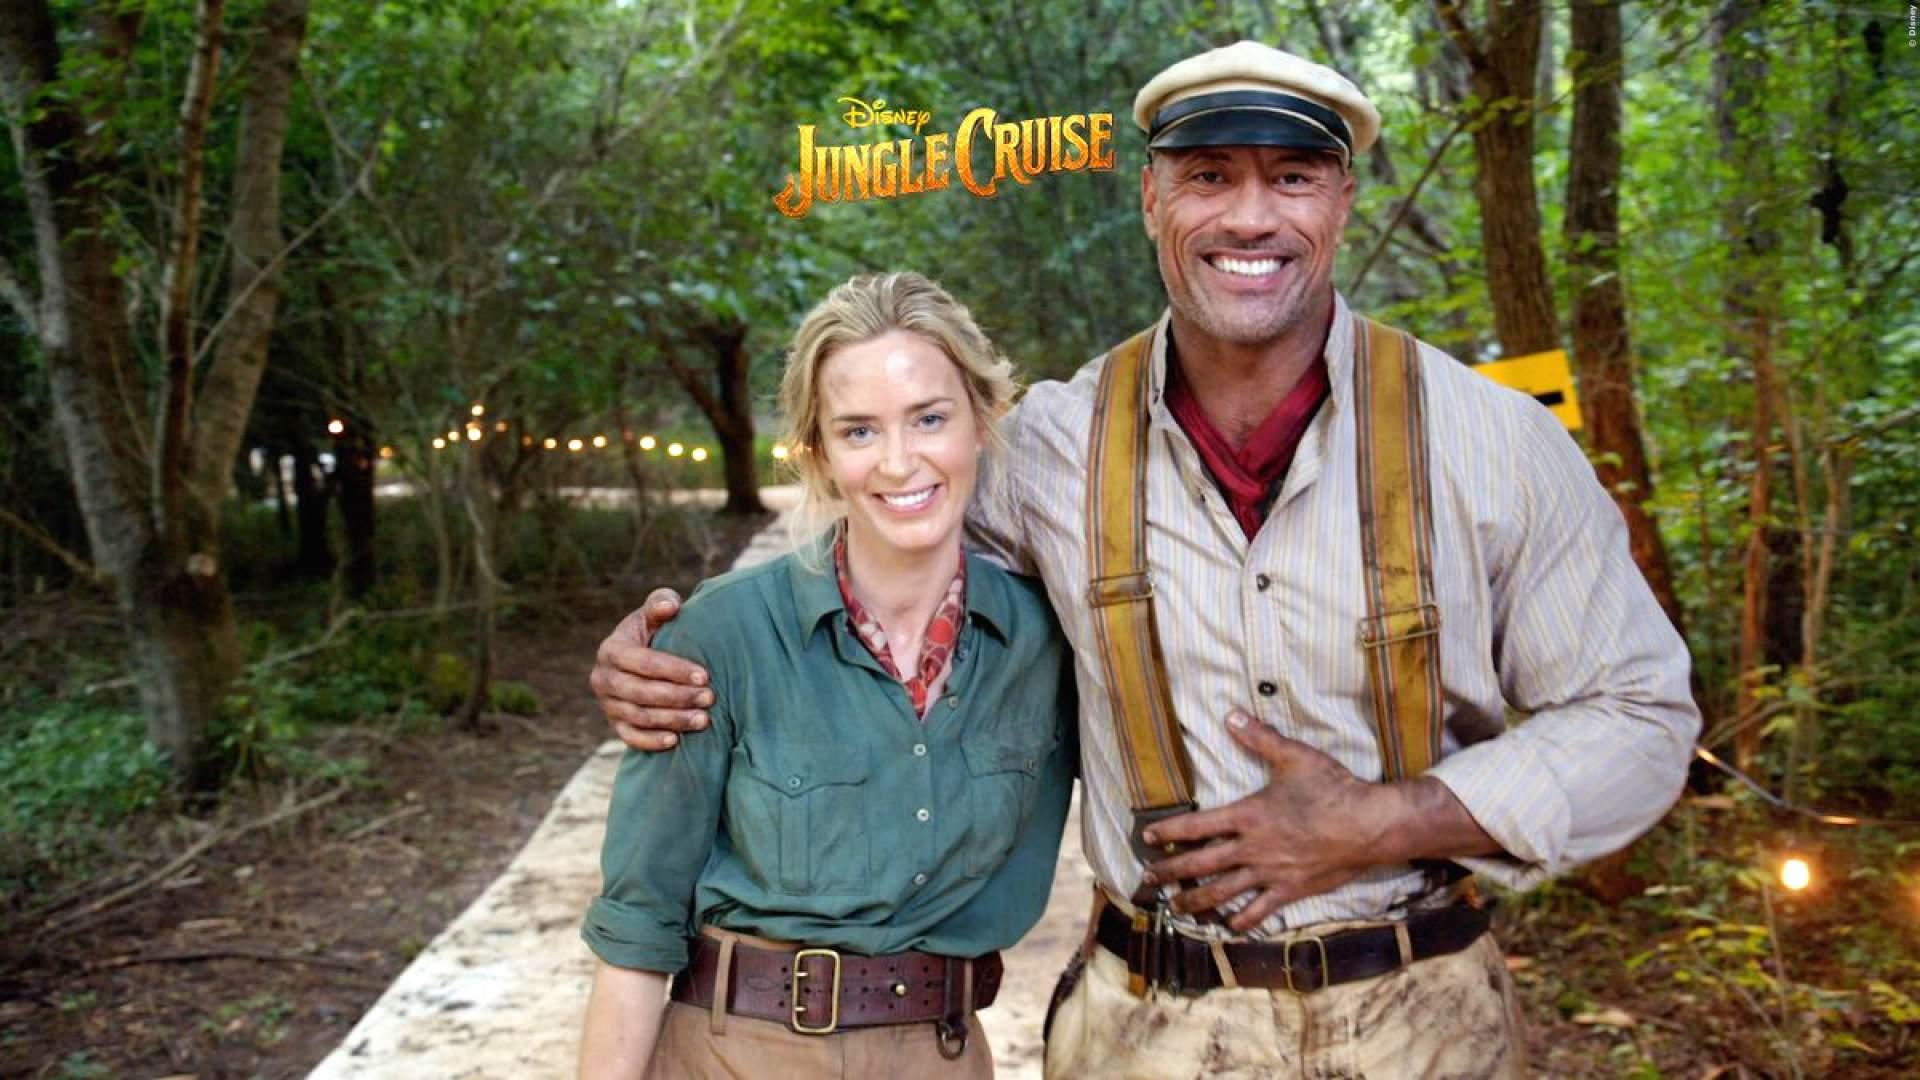 Dwayne Johnson Erstes Video Zu Jungle Cruise Mit Dwayne